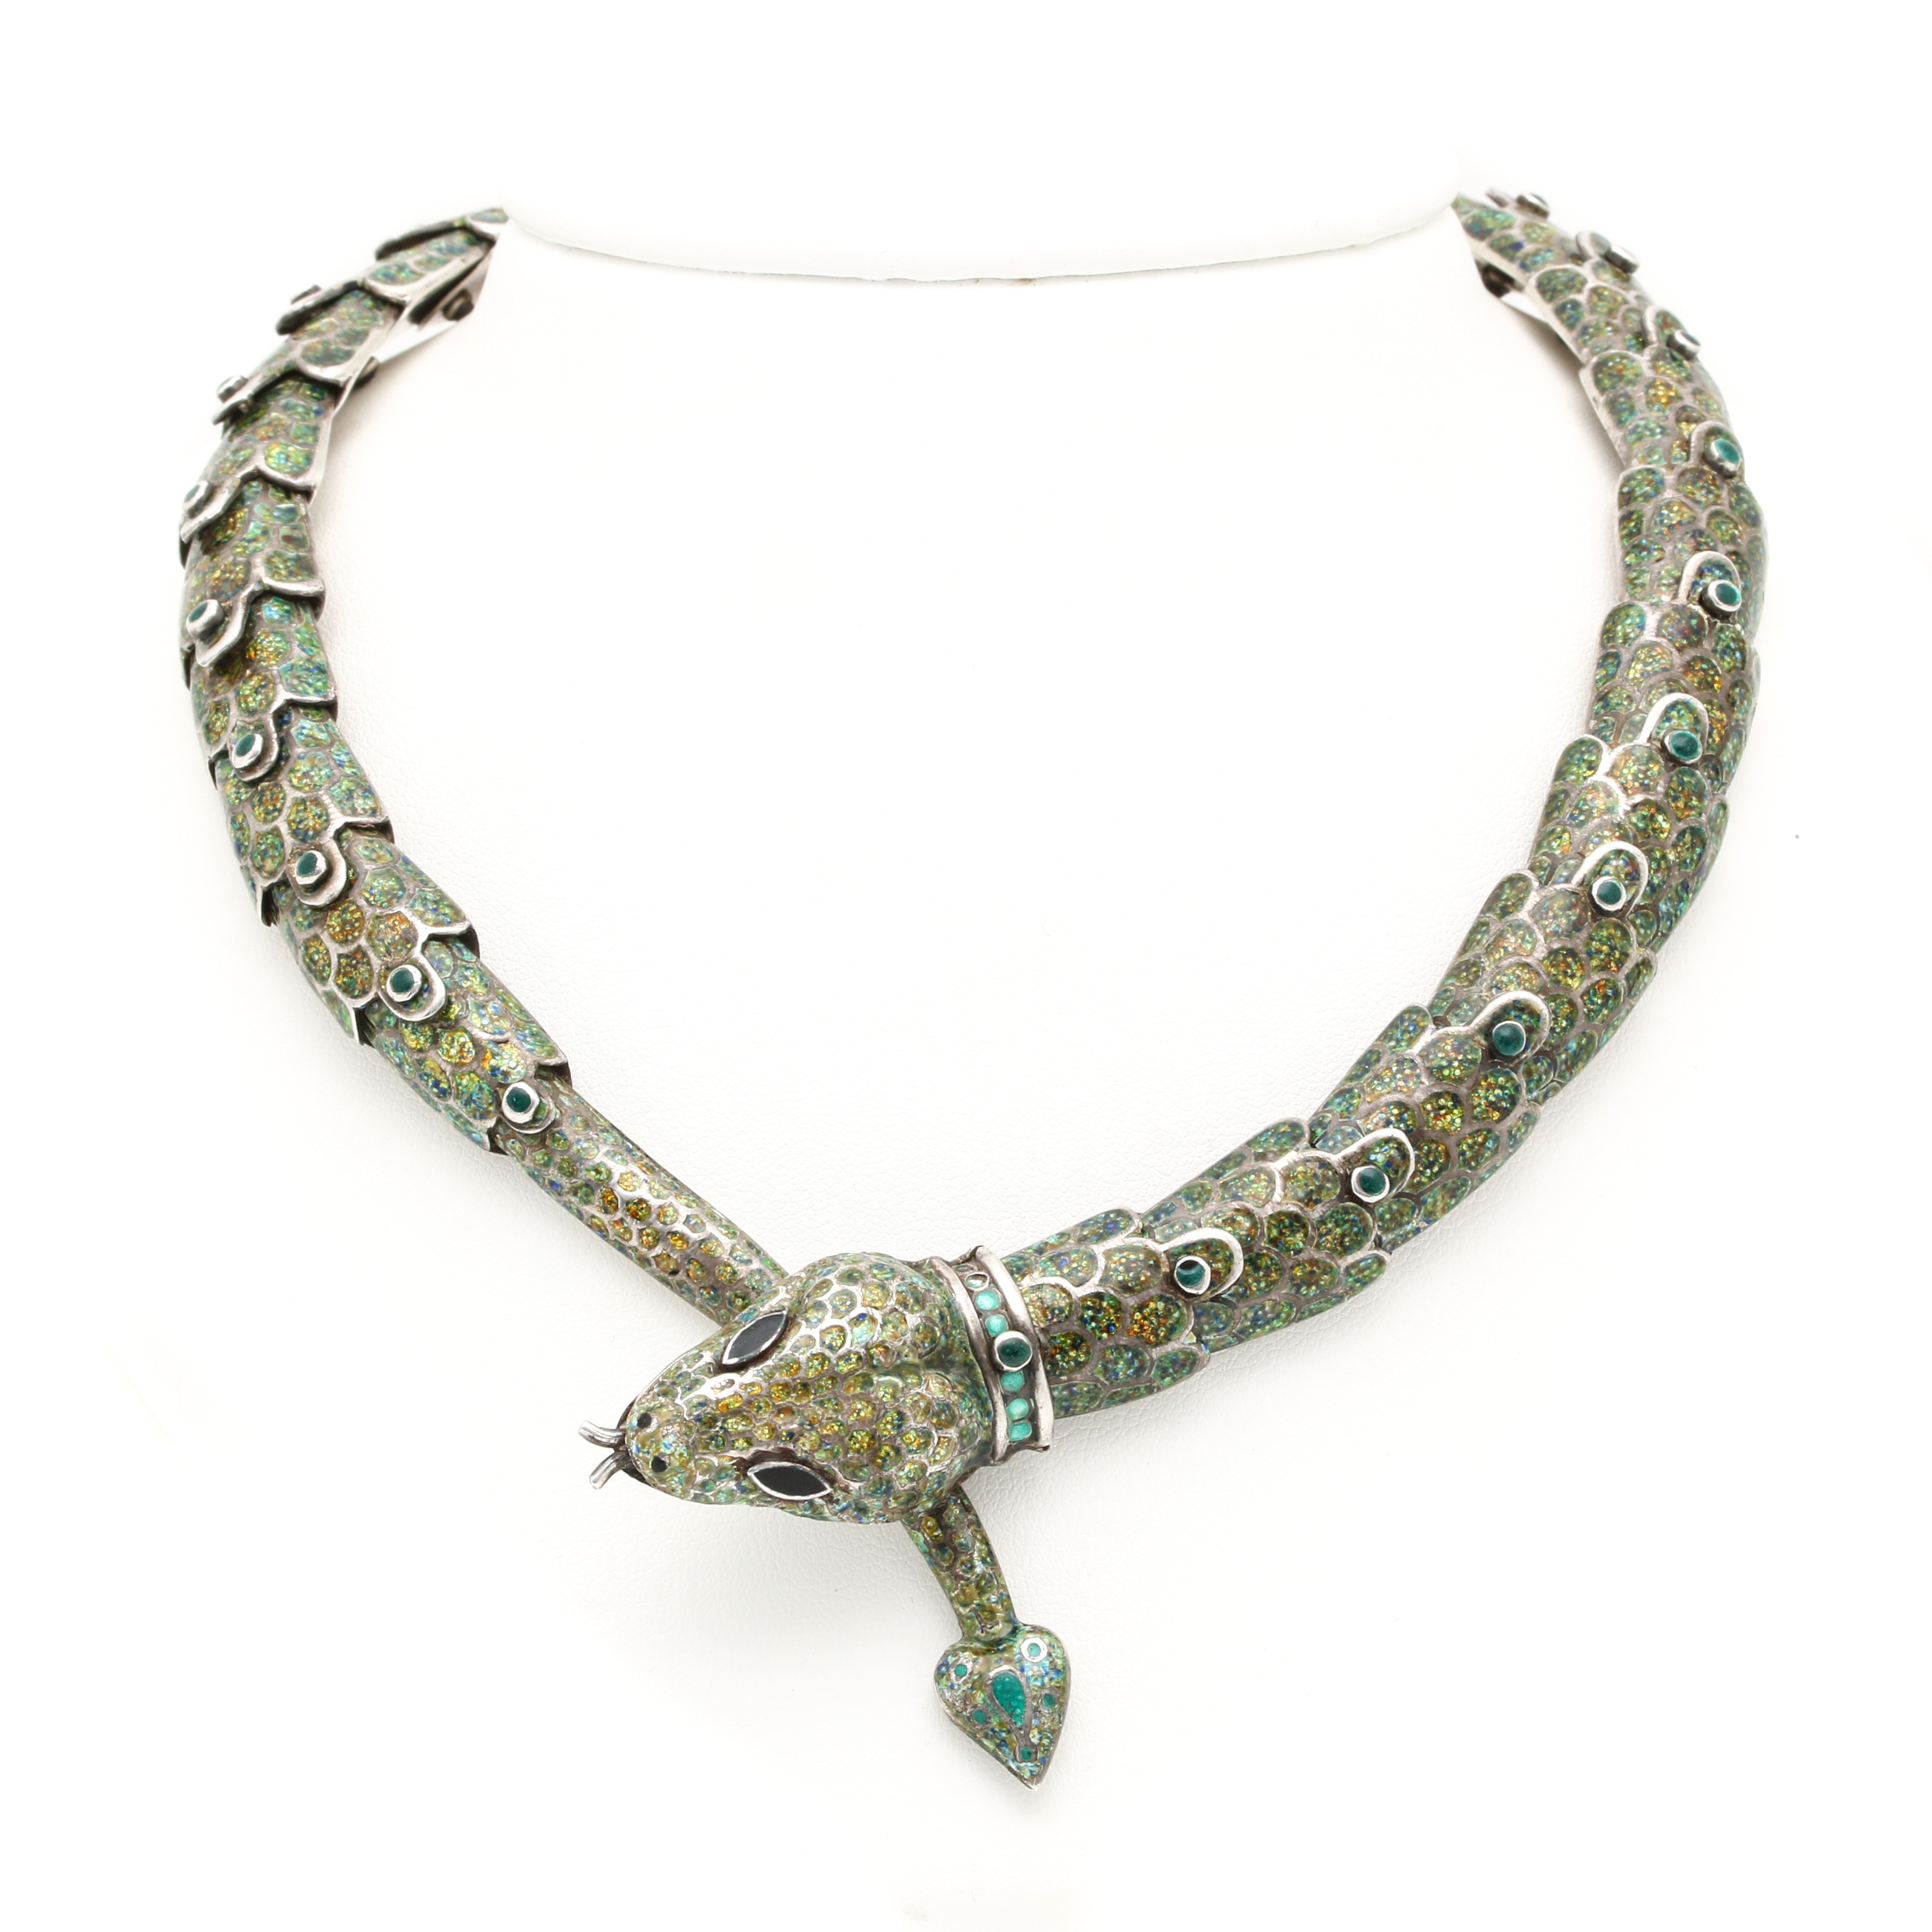 Vintage Margot de Taxco Enamel Snake Collar Necklace